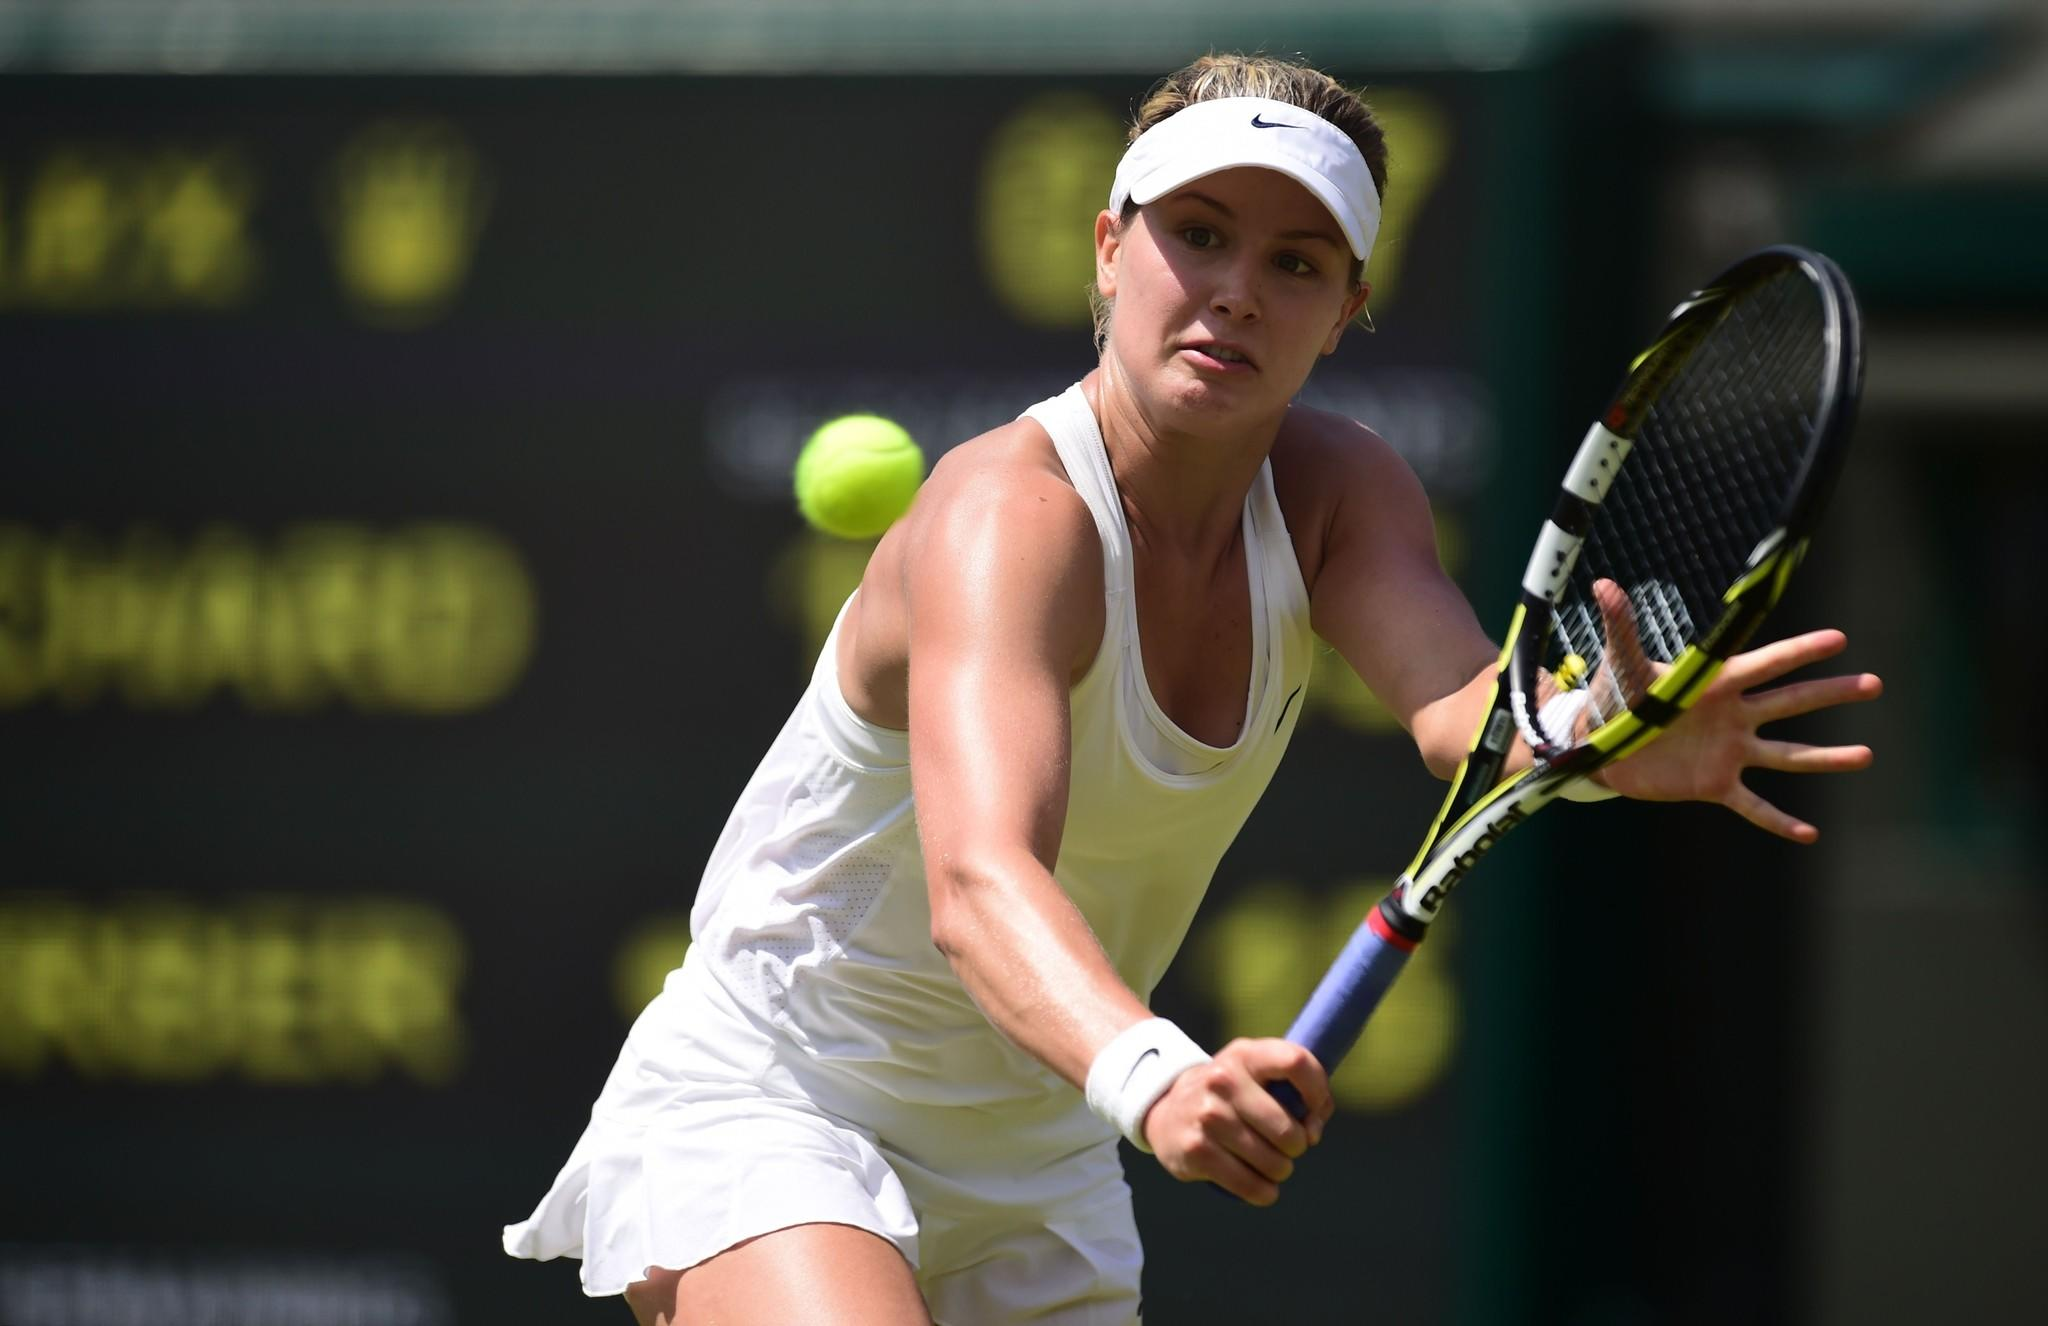 Eugenie Bouchard returns to Angelique Kerber during their women's singles quarterfinal match.